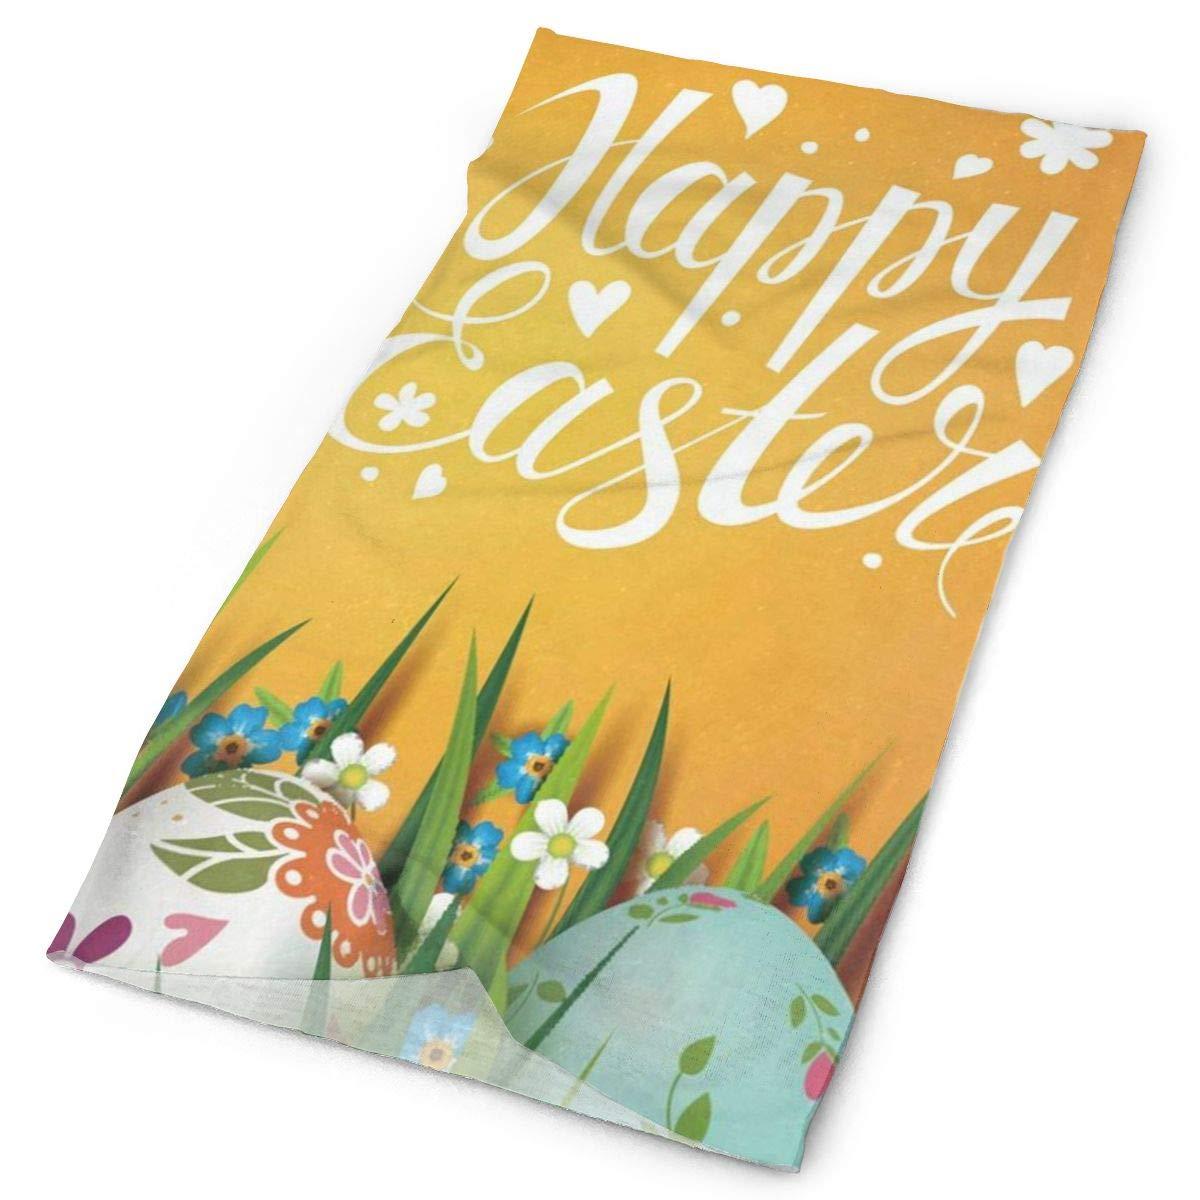 Diadema de huevos de Pascua felices flores florales mariposa, pañuelo para exterior, máscara para cuello, banda para el sudor, gorros deportivos